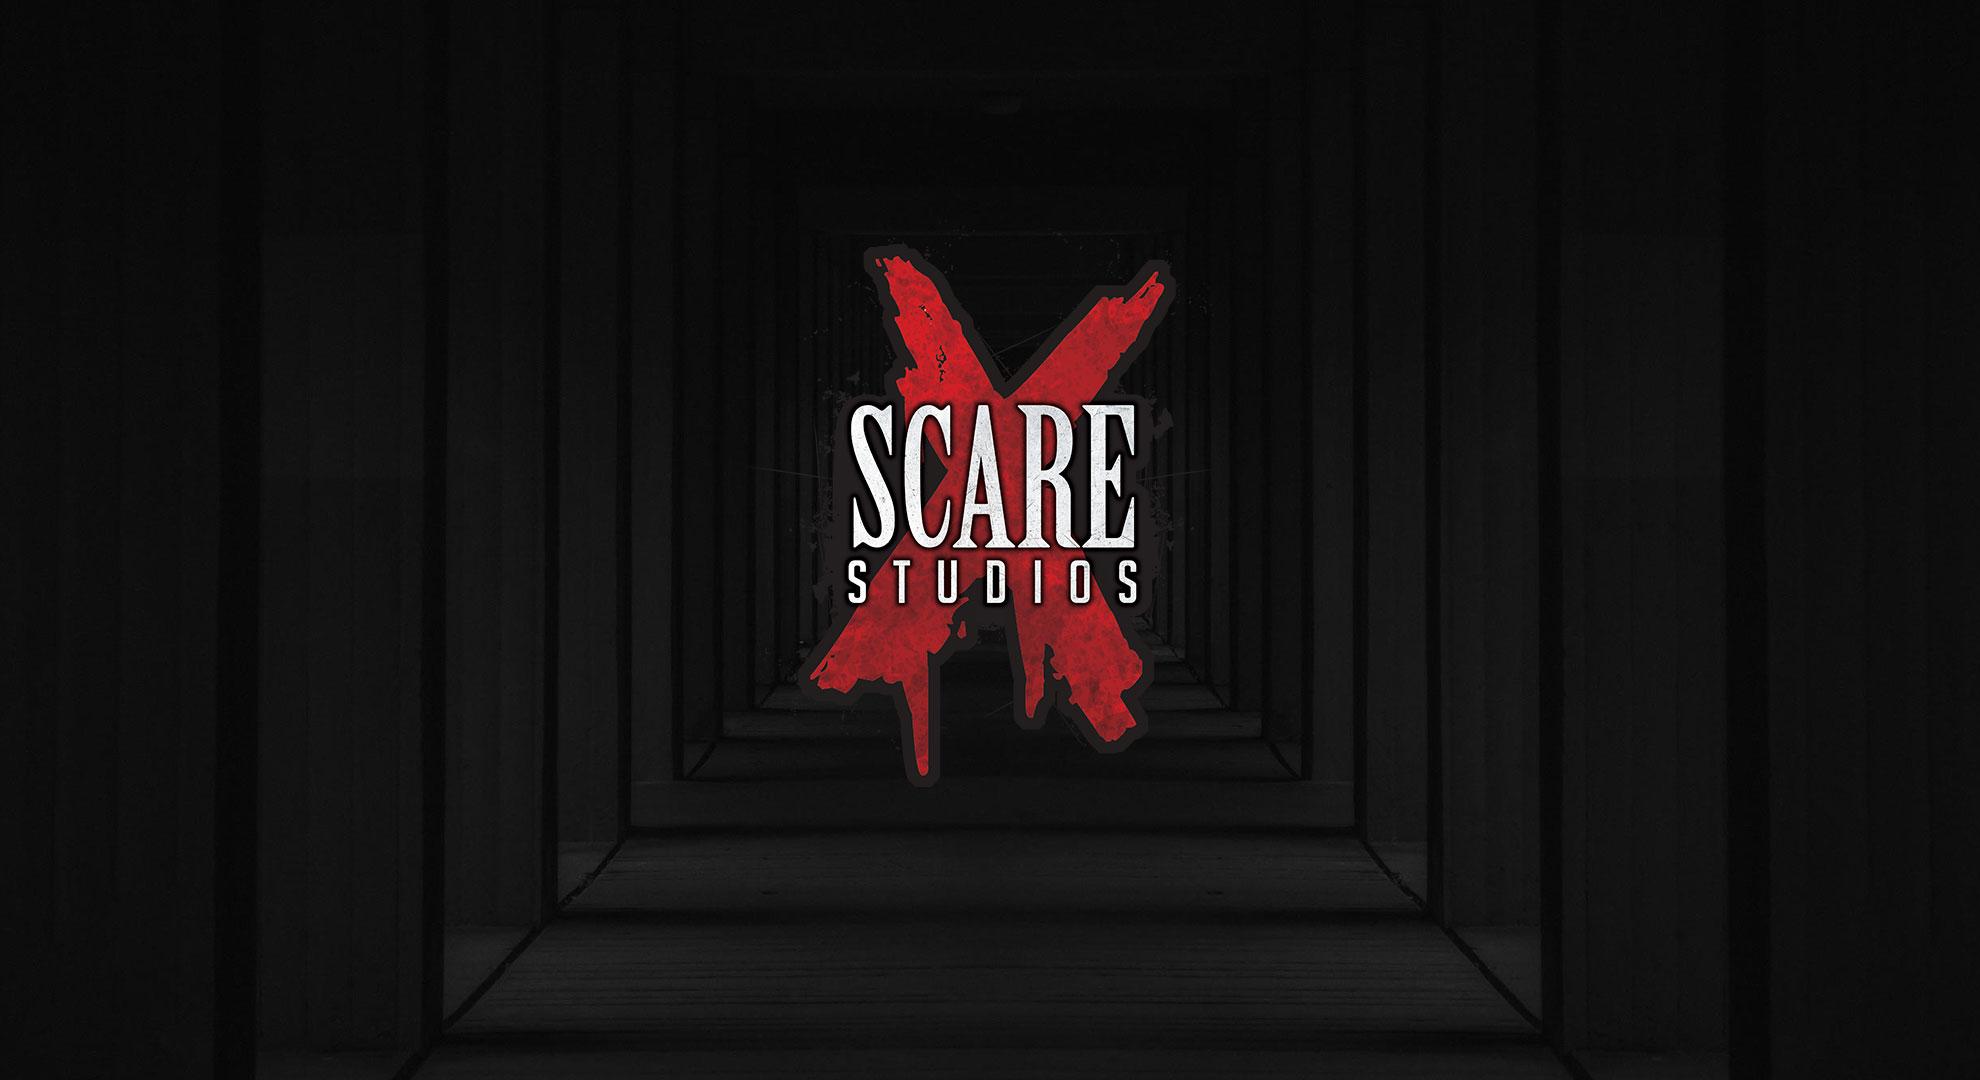 Best halloween event Miami, Haunted house Miami, scariest haunted houses, halloween carnival, Horror house.